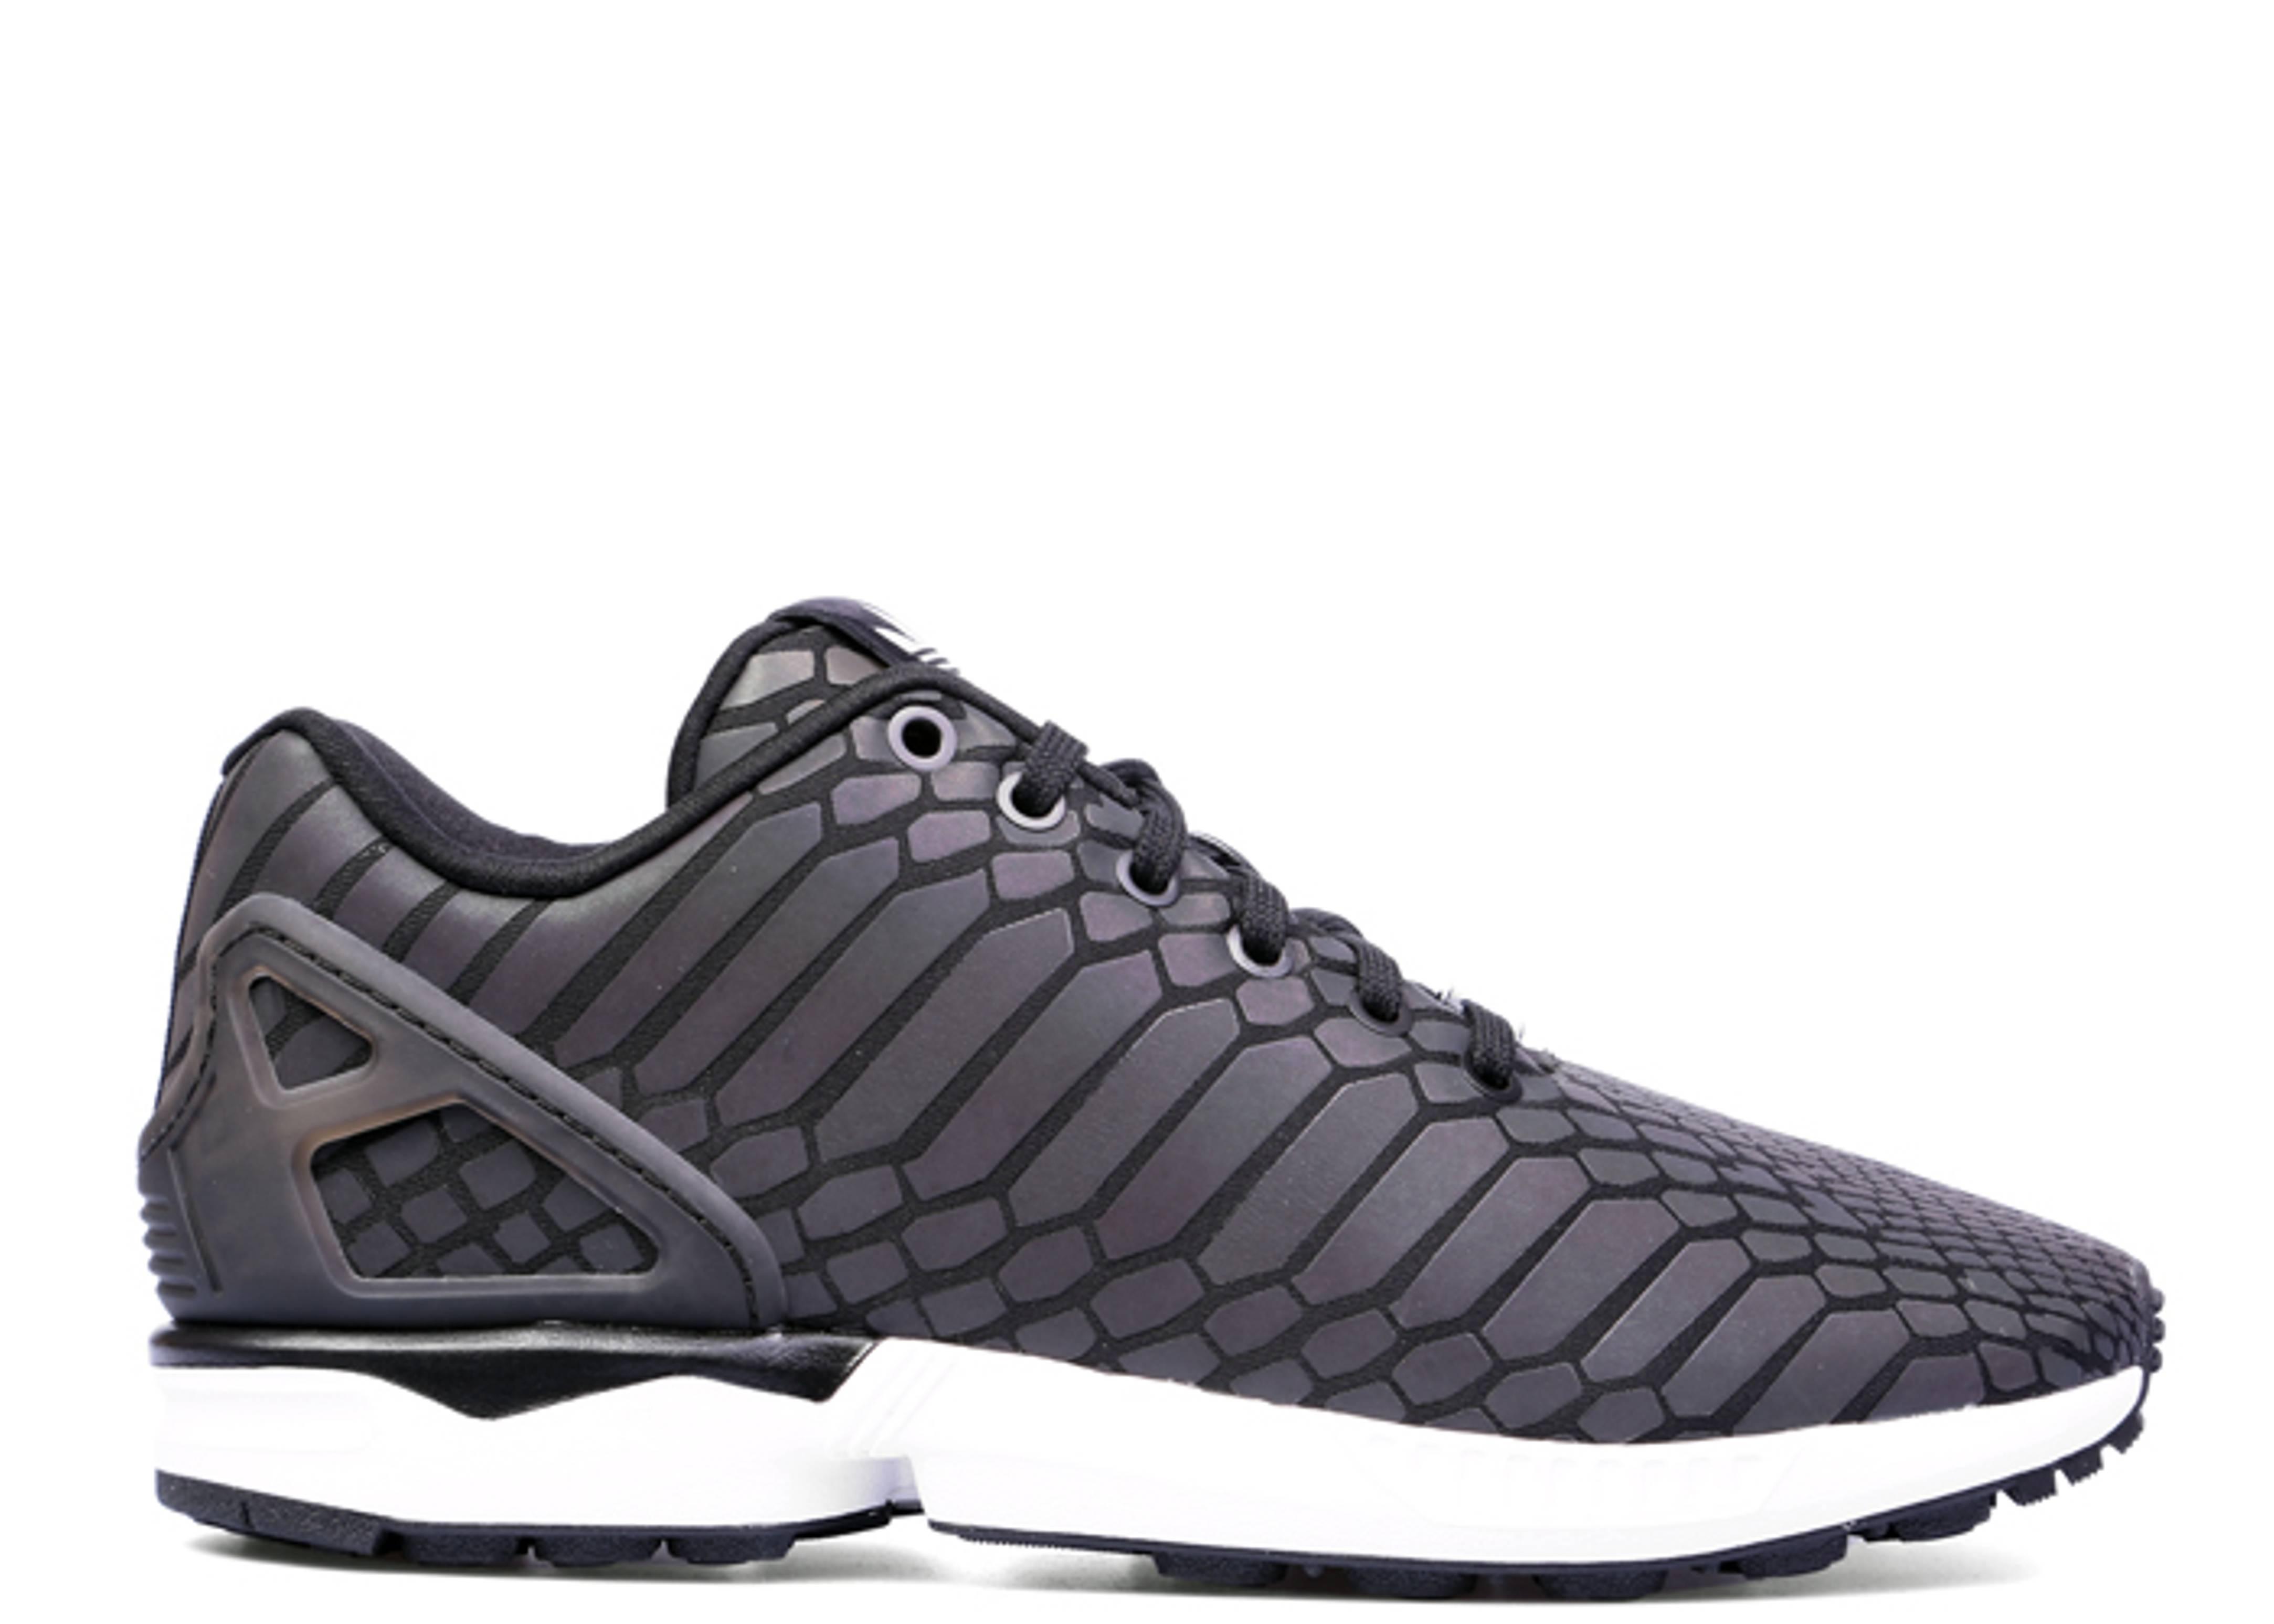 36adfc55d0ff3 shop adidas zx flux 44033 1f38a  norway zx flux xeno adidas b24441 cblack  supcol ftwwht flight club 52aa7 c22d5